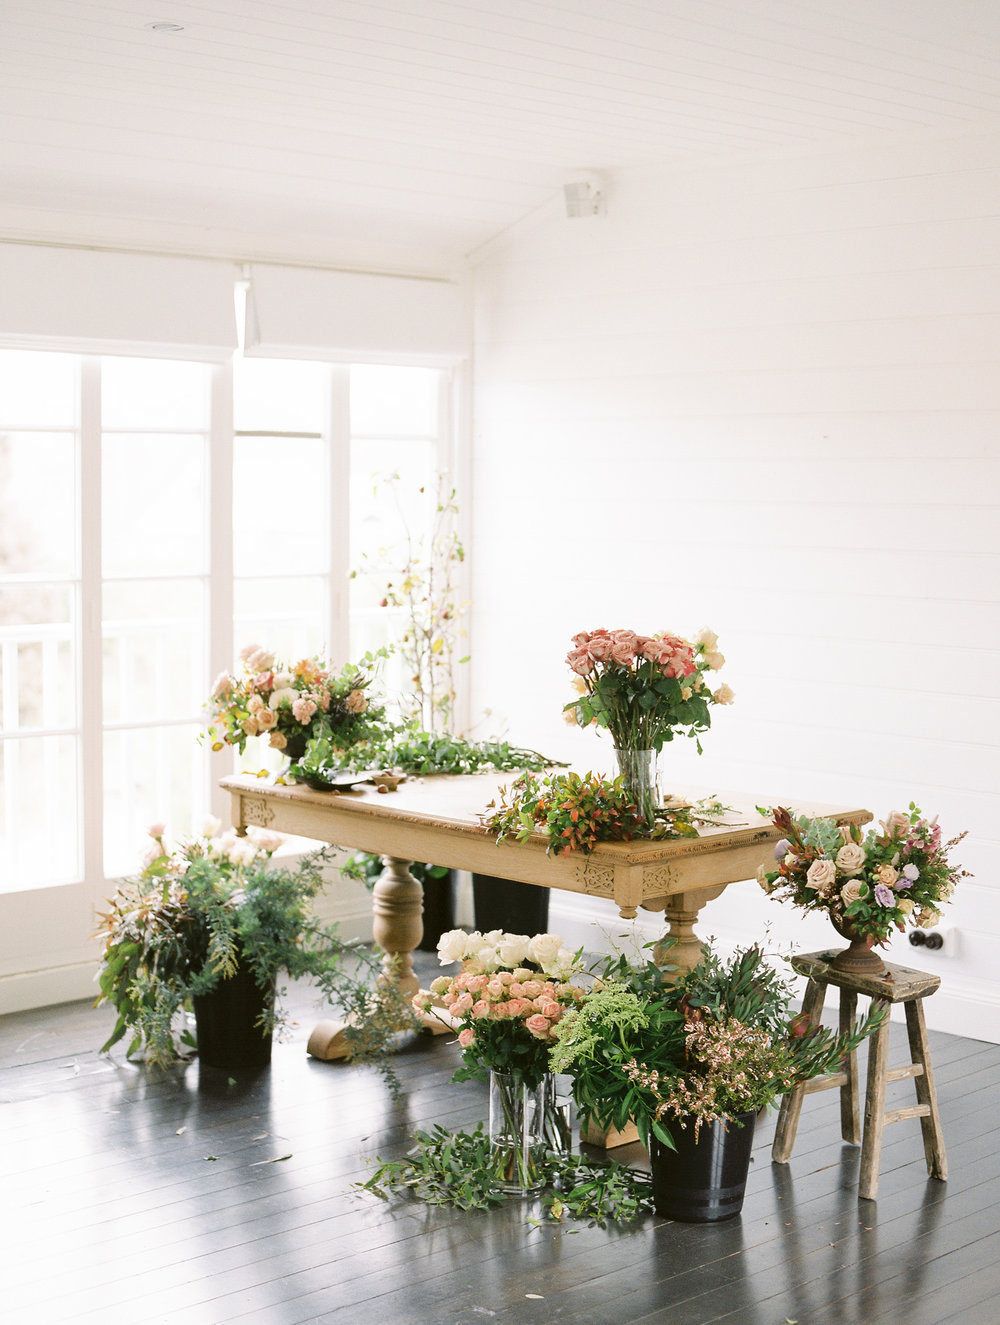 sandra-chau-stylist-floral-florist-branding-lifestyle-shoot-we-are-origami149.jpg